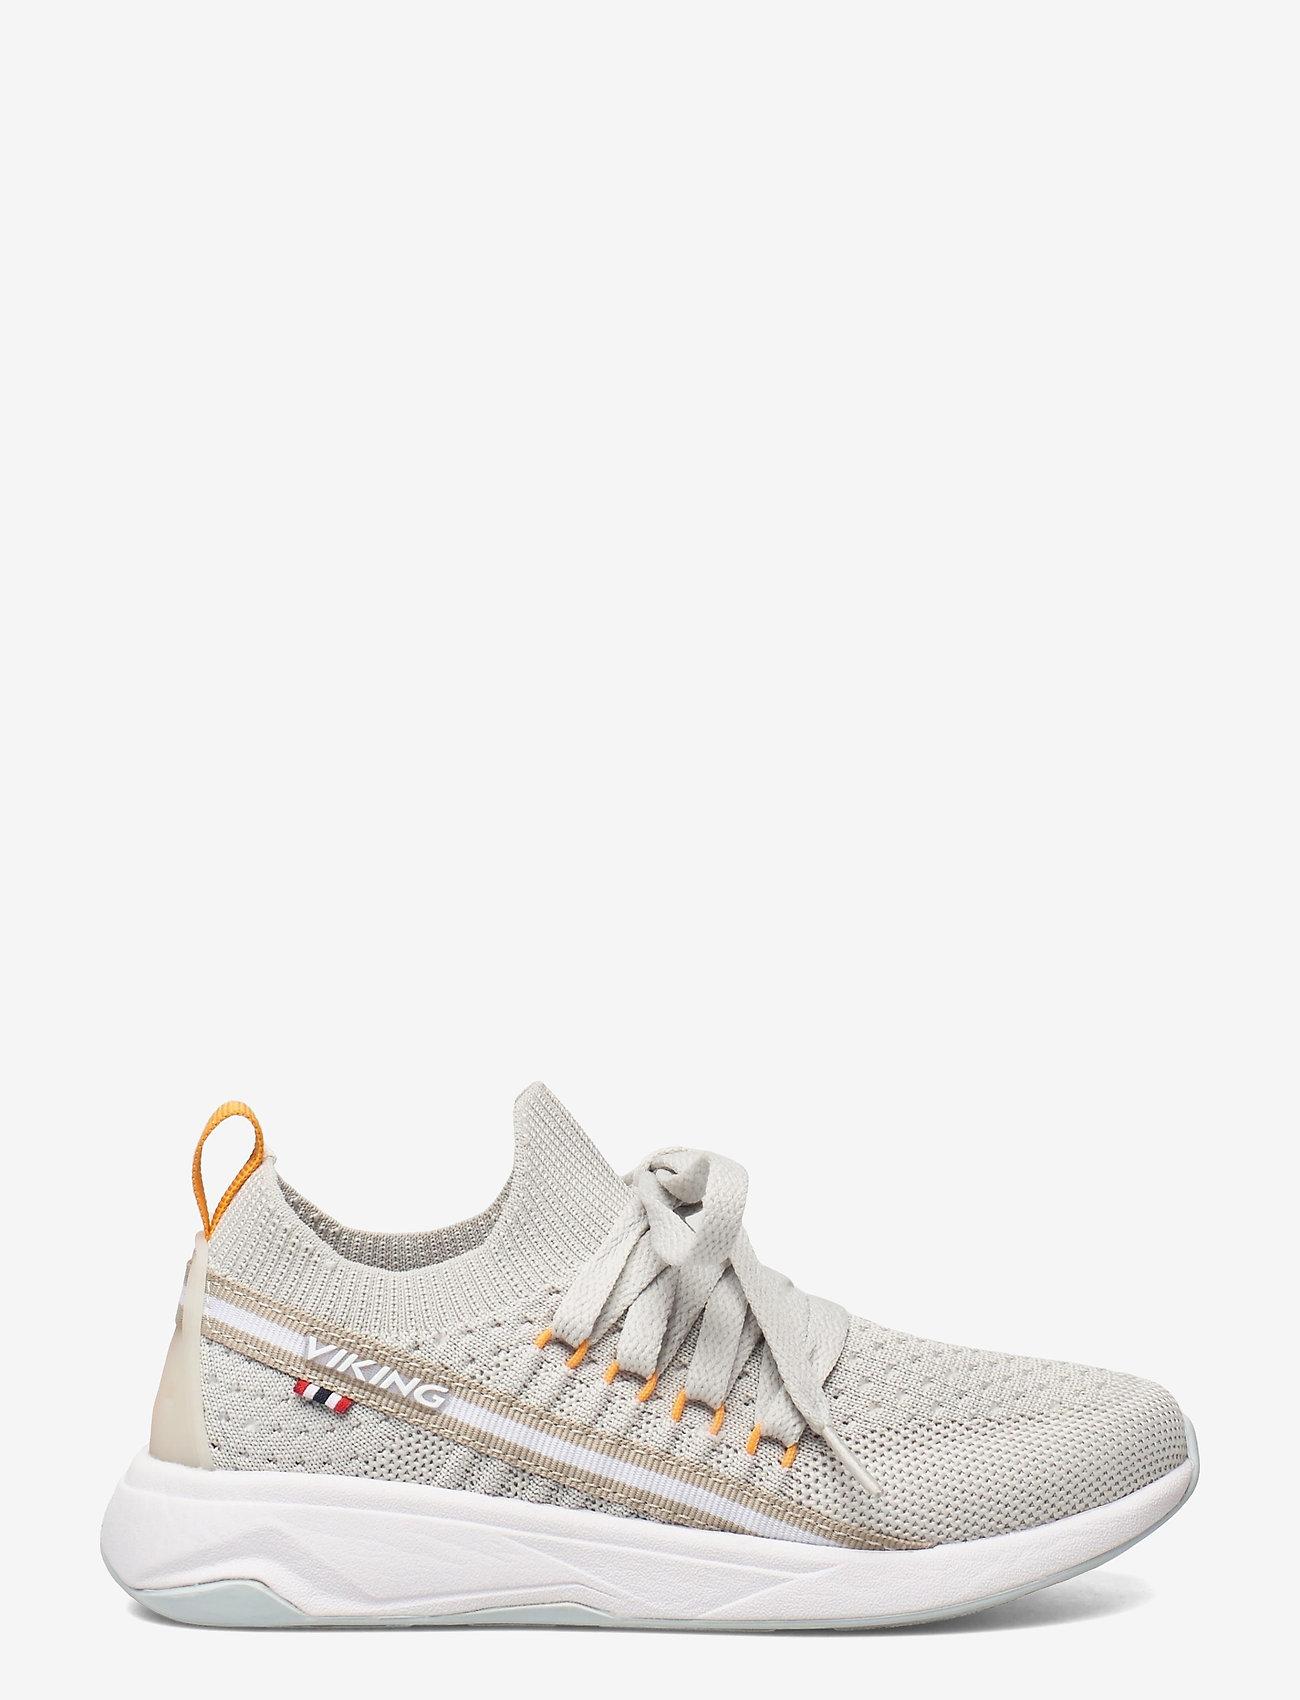 Viking - Engvik - low-top sneakers - light grey/apricot - 1